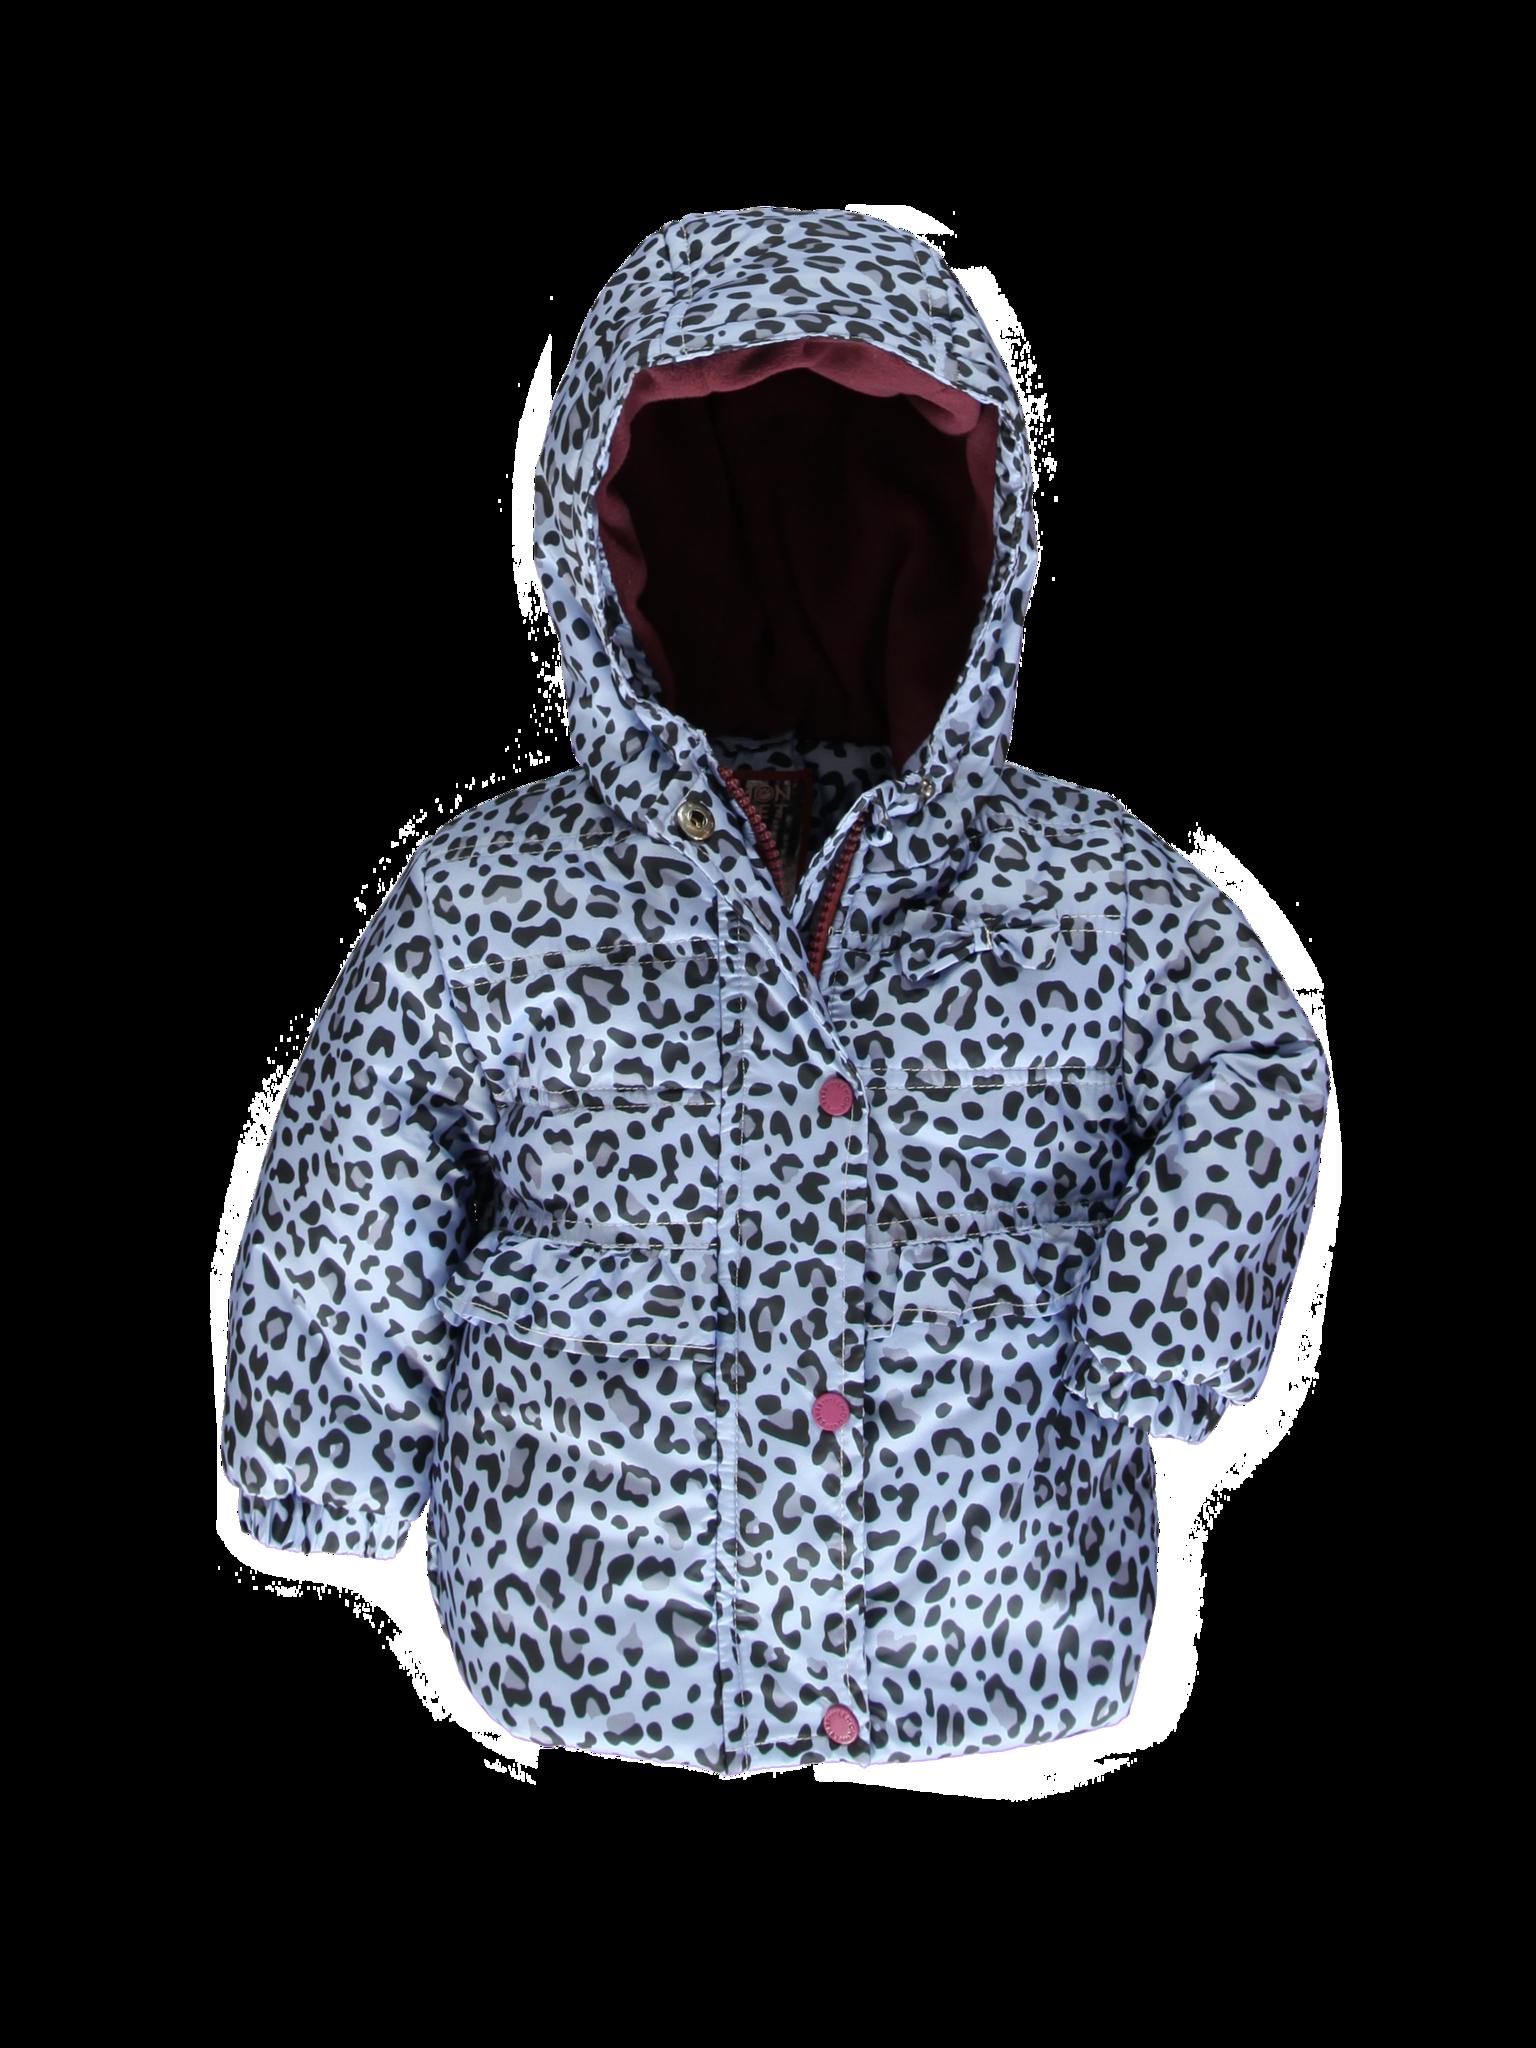 All Brands   Winterproducts Baby   Jacket   8 pcs/box